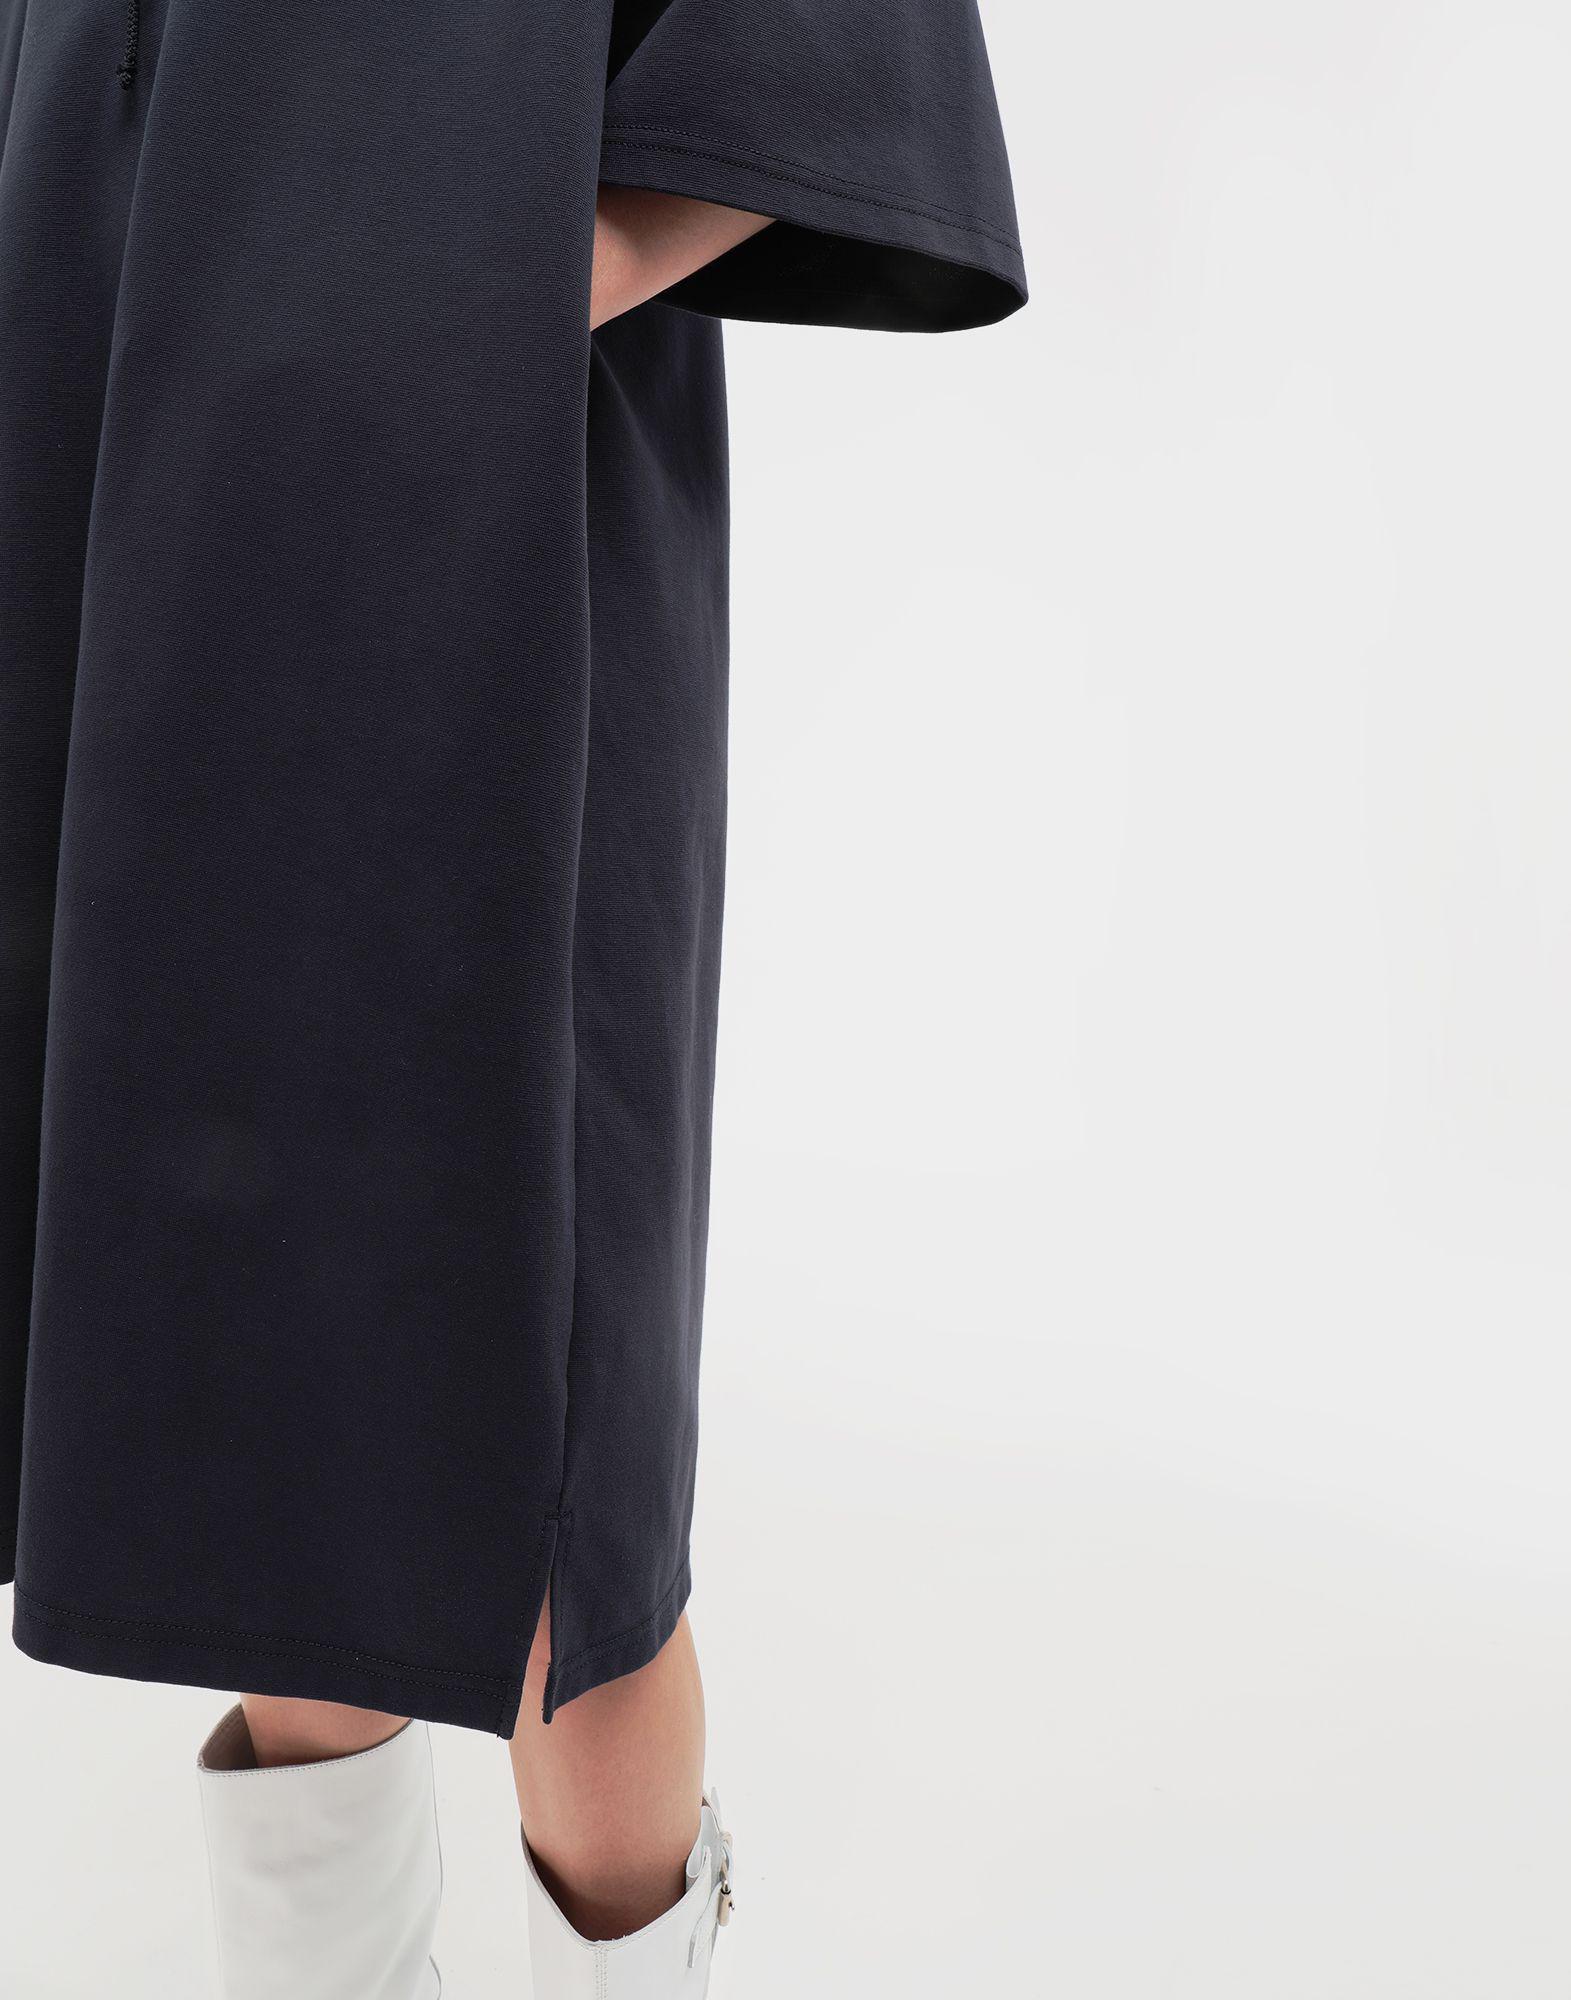 2460f776cc1 MM6 by Maison Martin Margiela Oversized Hooded Dress in Blue - Lyst